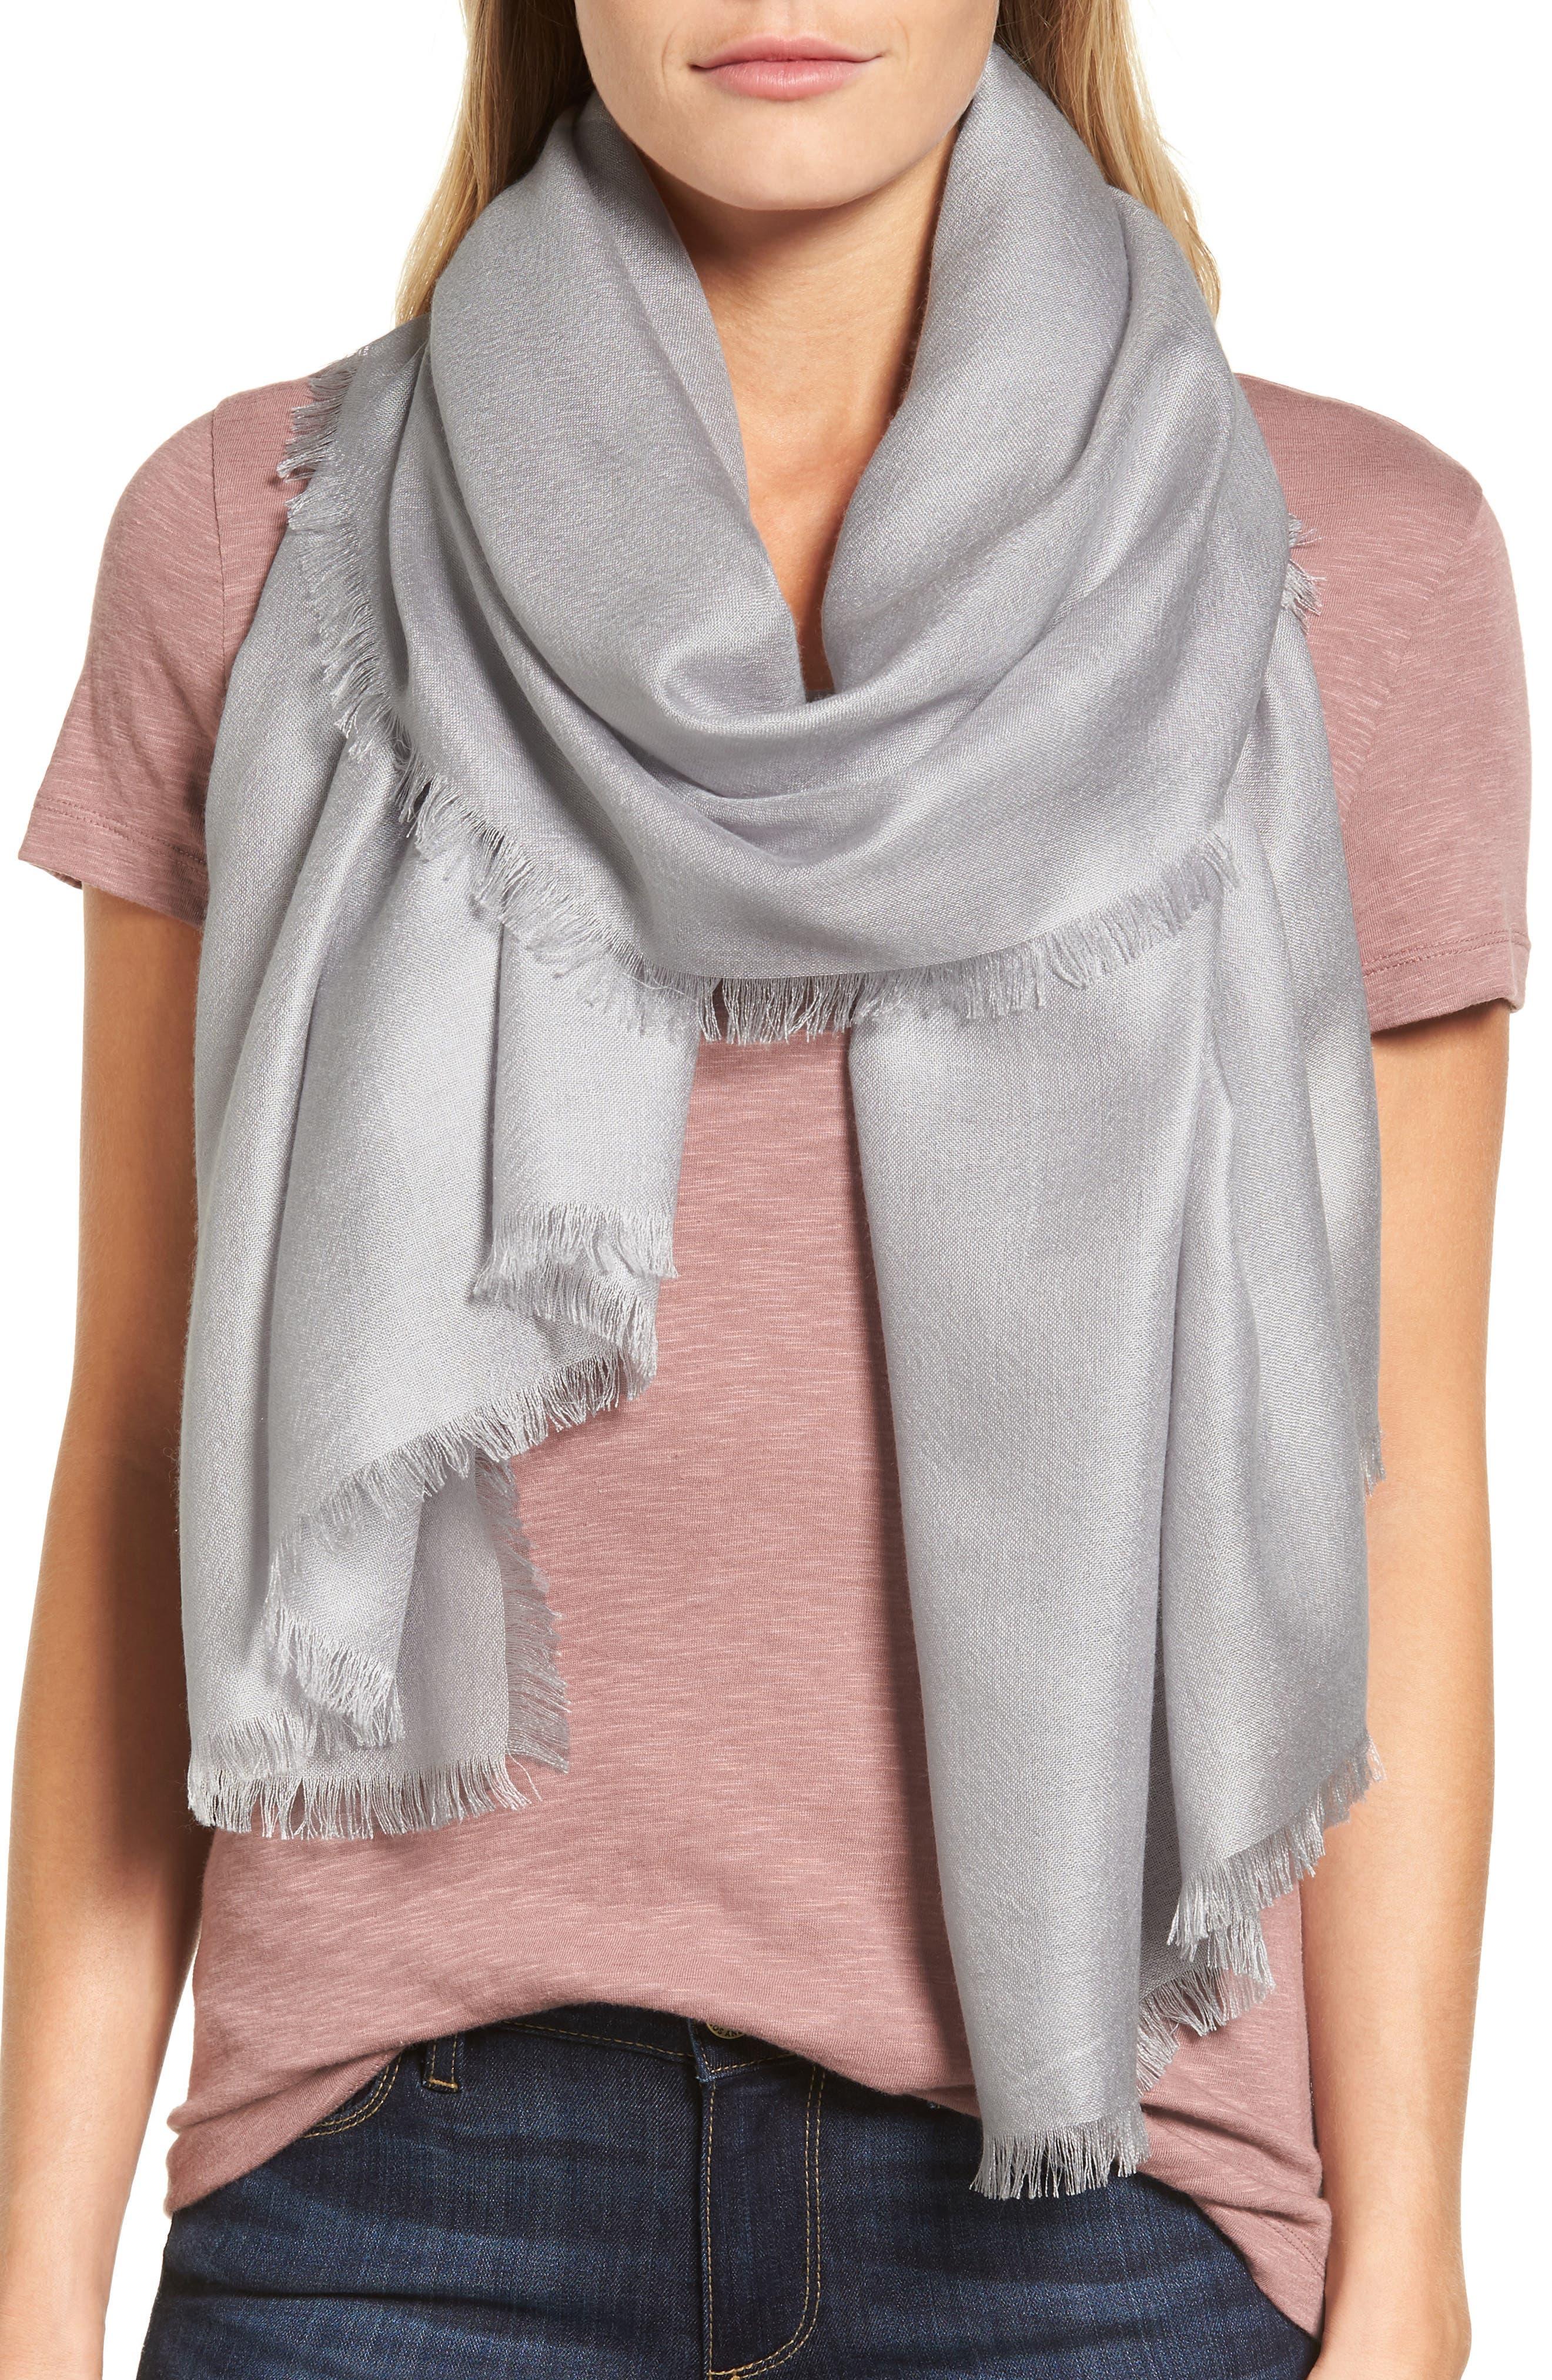 NORDSTROM Cashmere & Silk Wrap, Main, color, GREY SCONCE